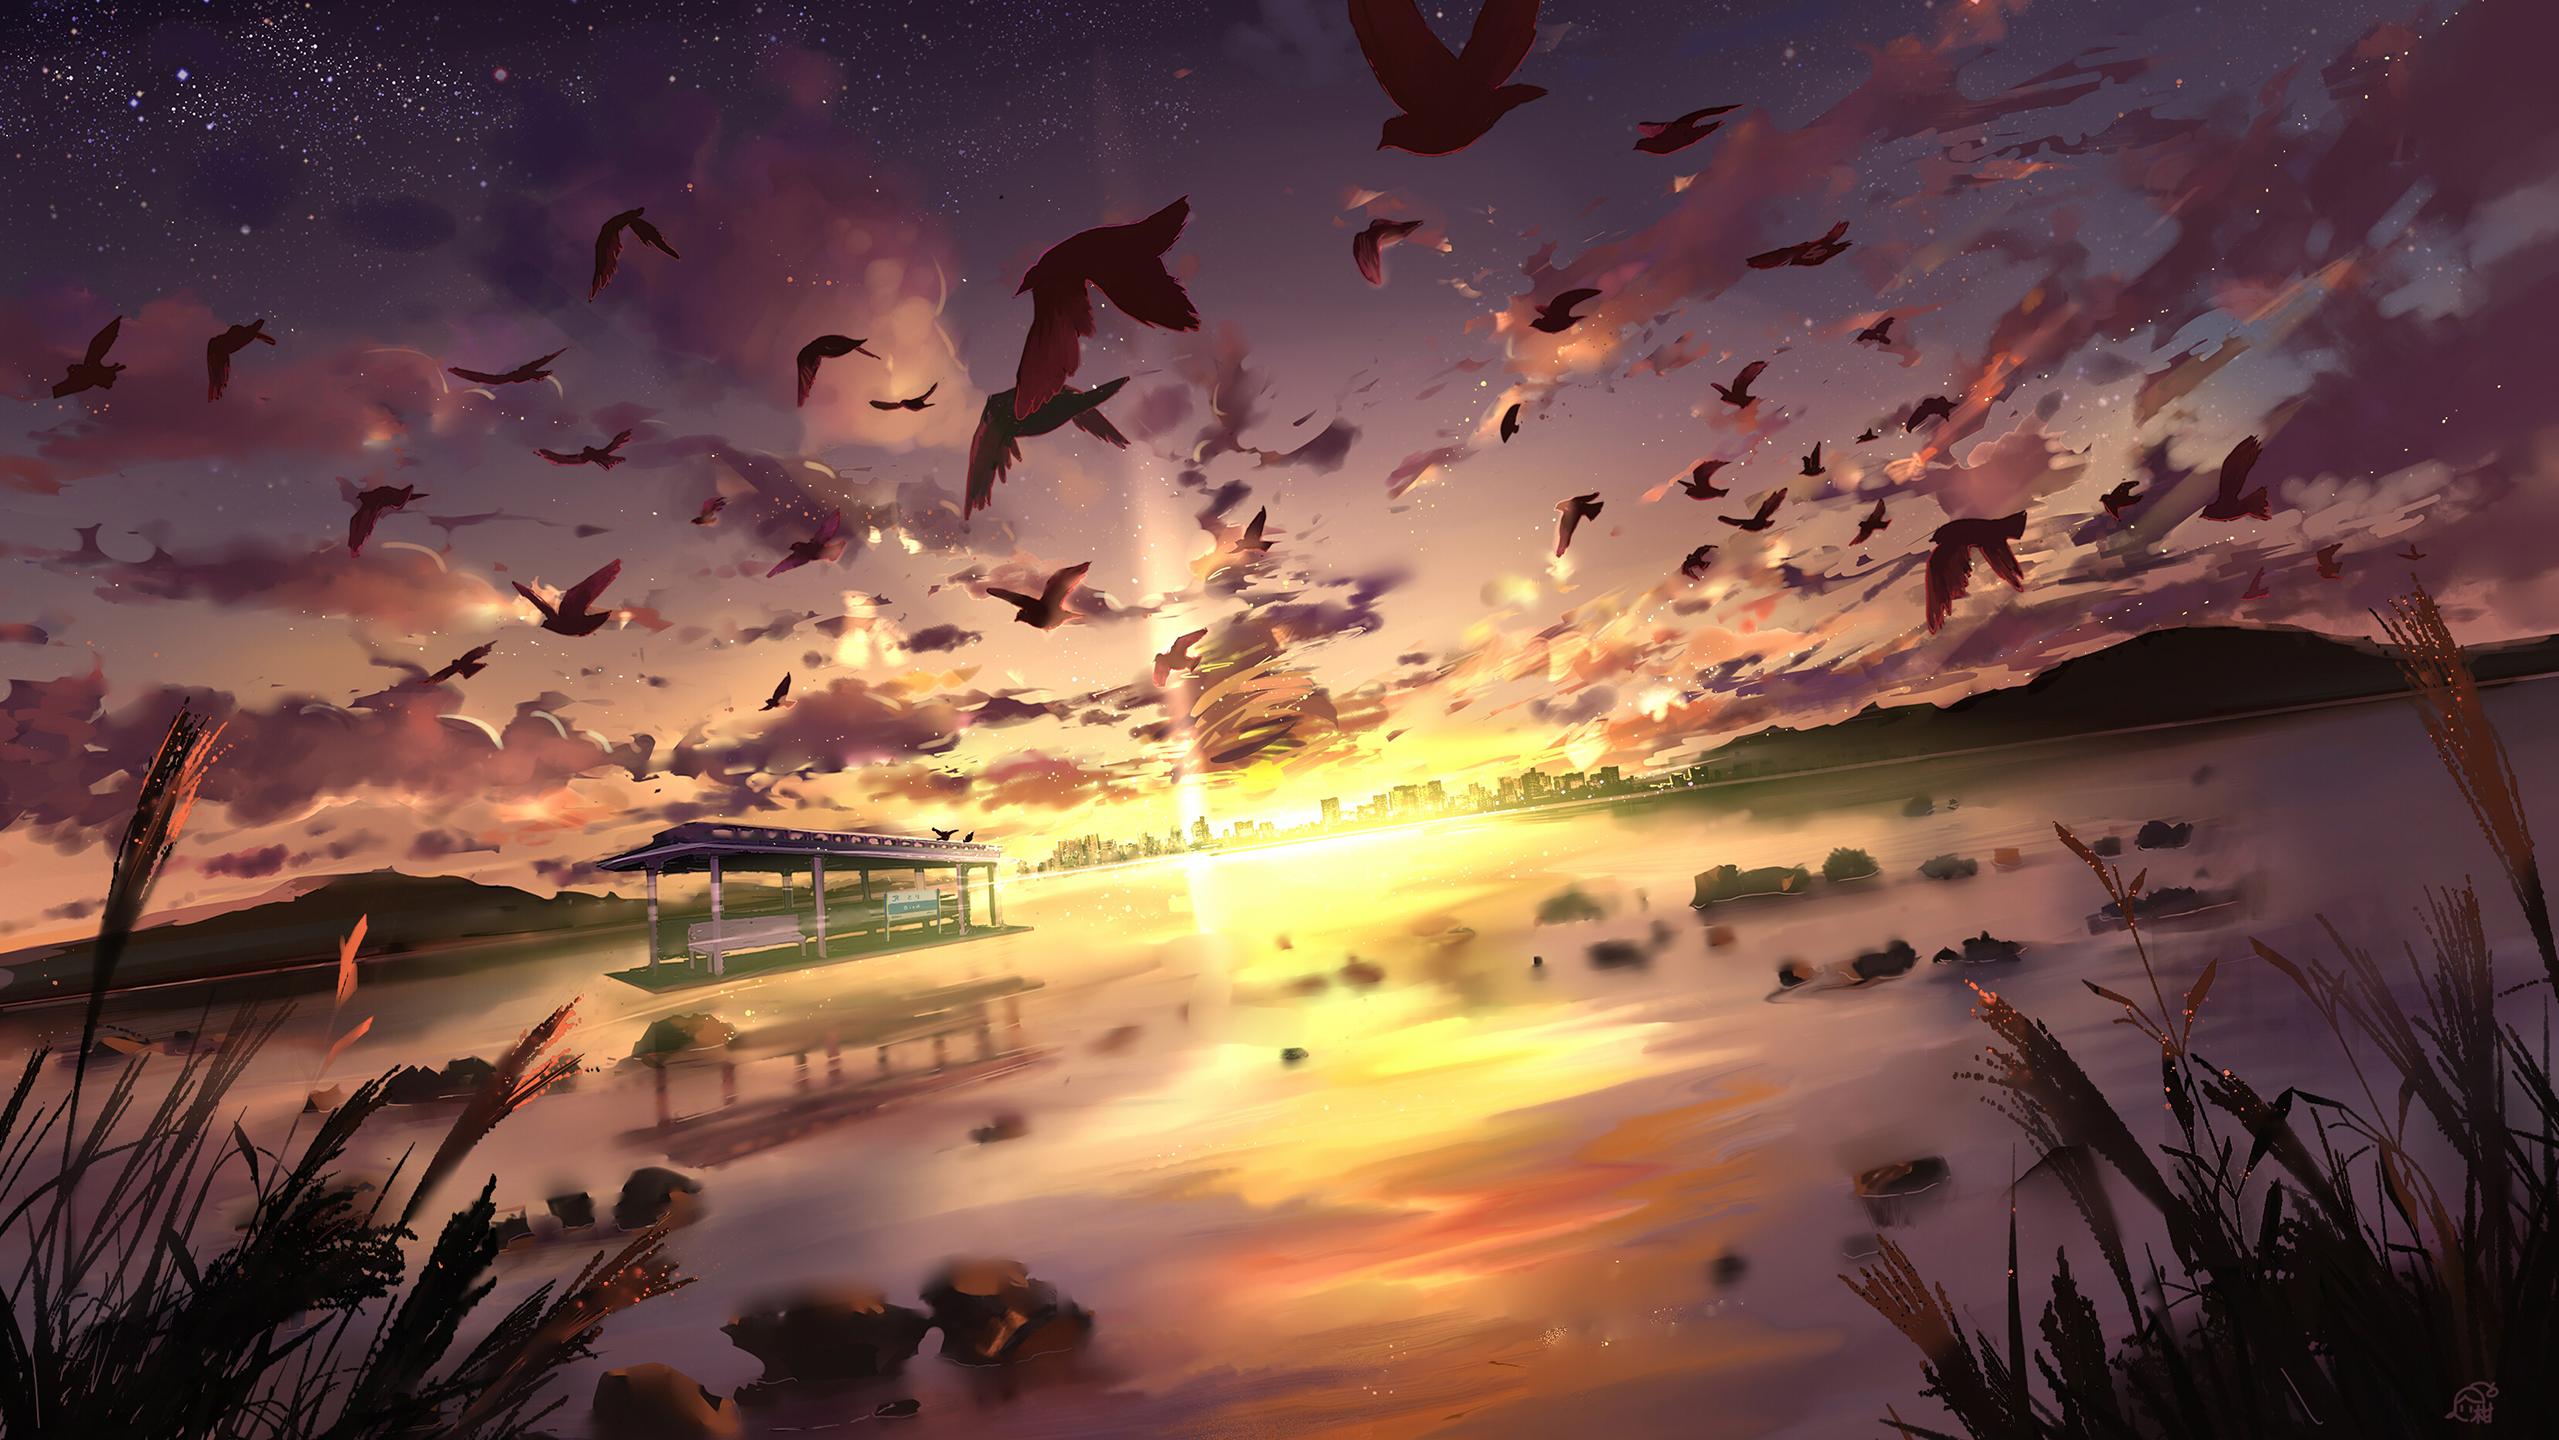 Anime Scenery Wallpaper   Anime Landscape 491322   HD Wallpaper 2559x1440